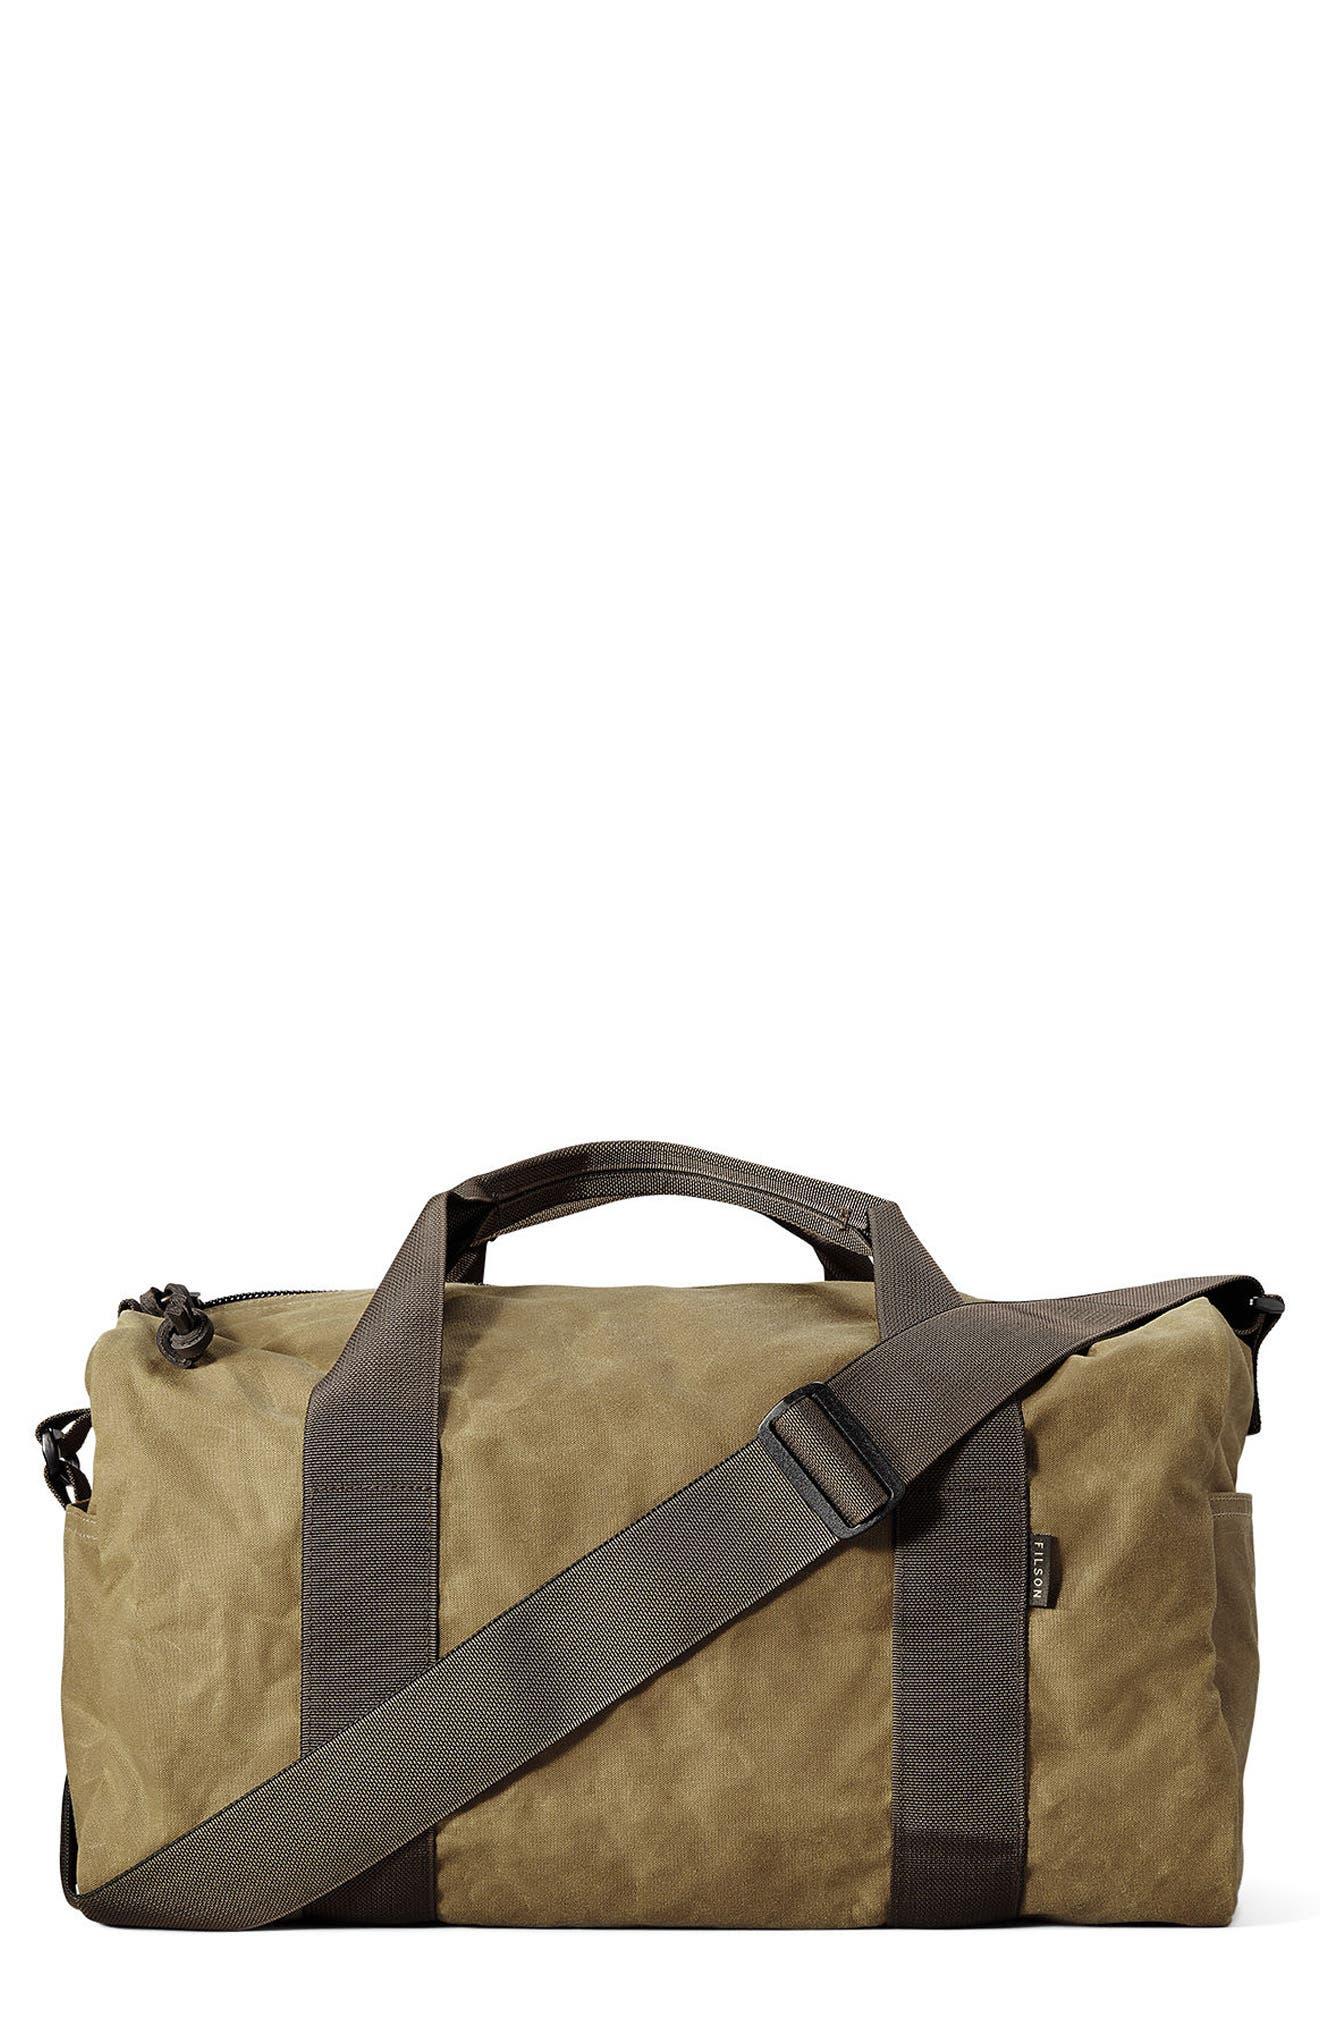 Small Field Duffel Bag,                             Main thumbnail 1, color,                             DARK TAN/ BROWN